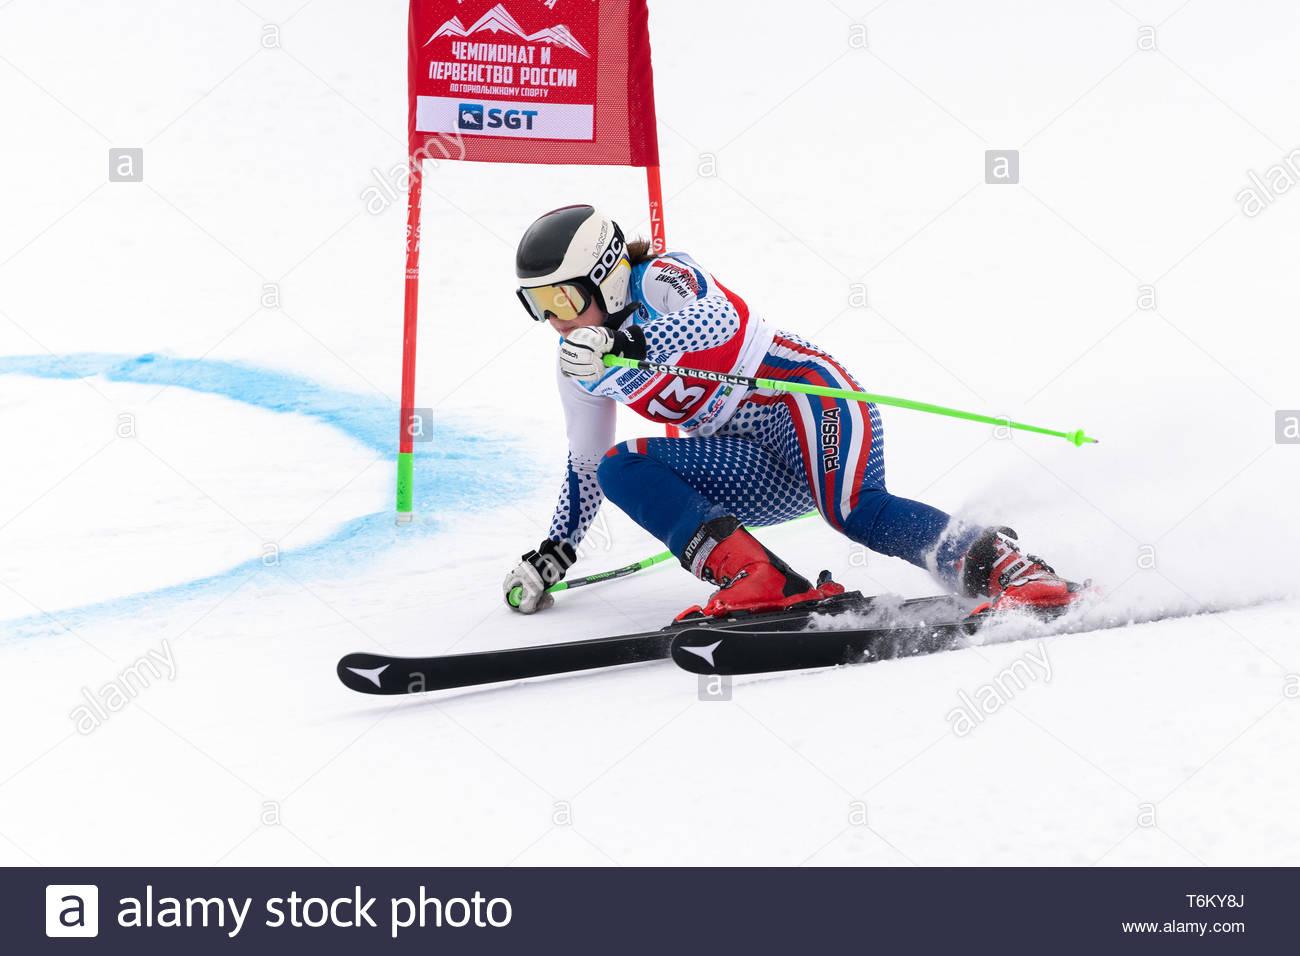 KAMCHATKA, RUSSIA - APR 2, 2019: Mountain skier Alena Khartsyzova (St. Petersburg) skiing down mount slope. International Ski Federation Championship, - Stock Image